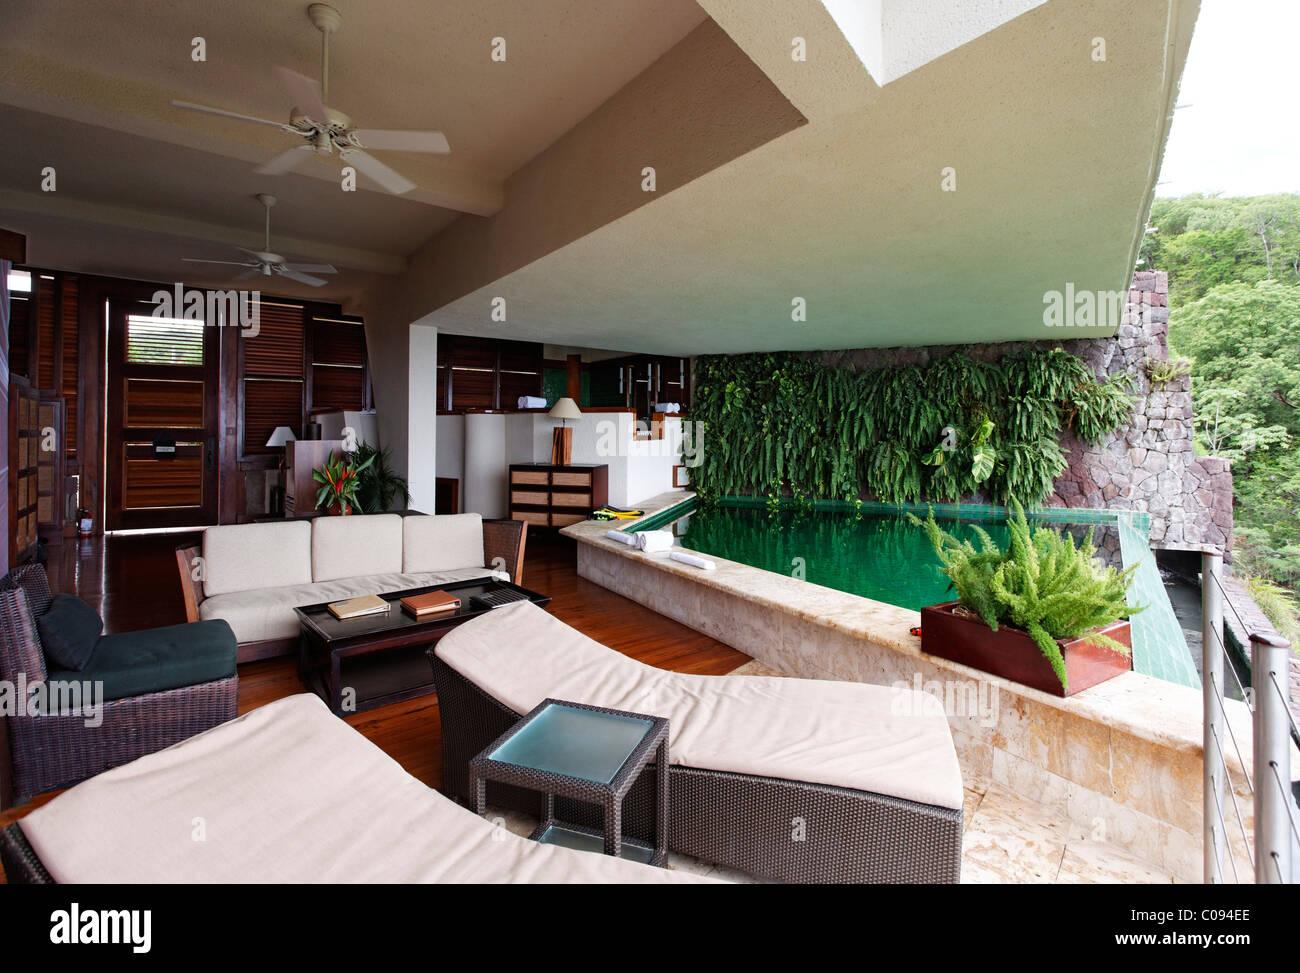 Suite, no external wall, sun bed, infinety pool, Jade Mountain luxury hotel, Saint Lucia, Windward Islands, Lesser - Stock Image